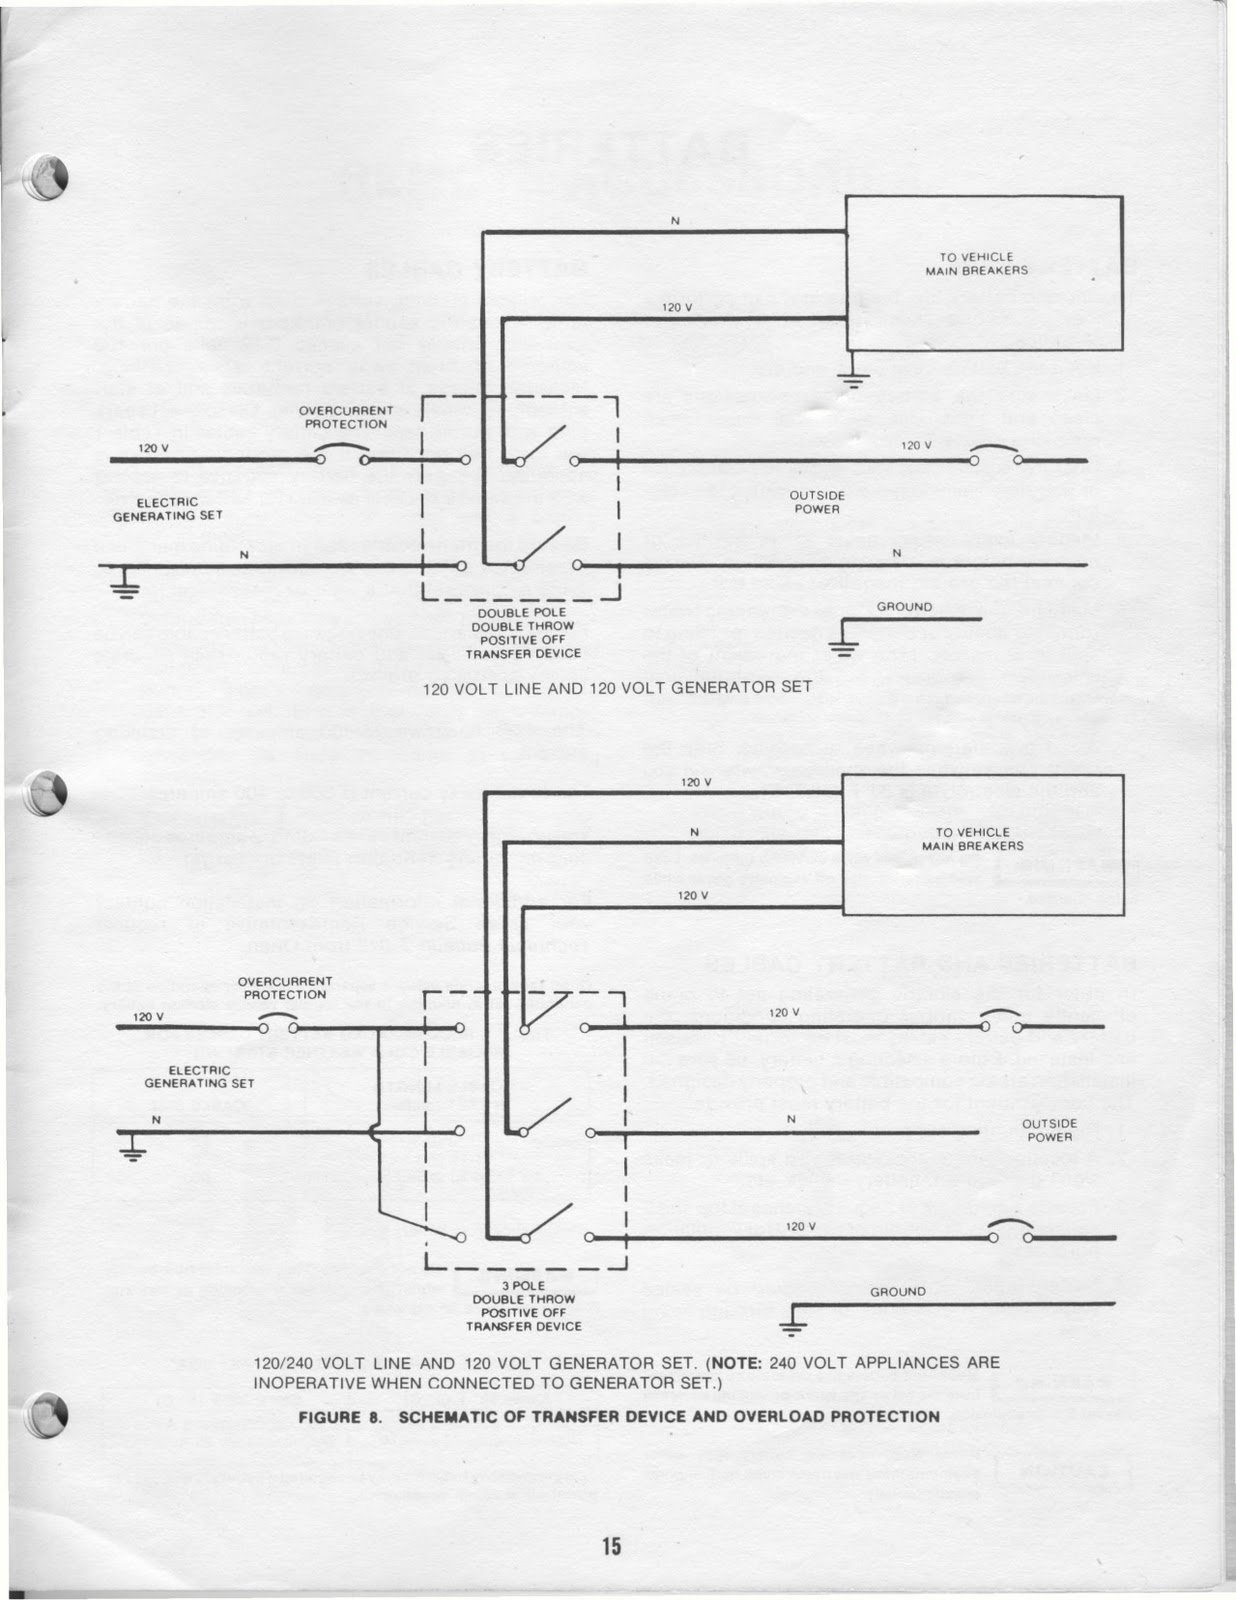 hight resolution of onan nh manual onan manual genuine onan n ignition coil kit includes coil bracket misc hardware etc replaces onan coil n bge nhe nhd bgm onan models